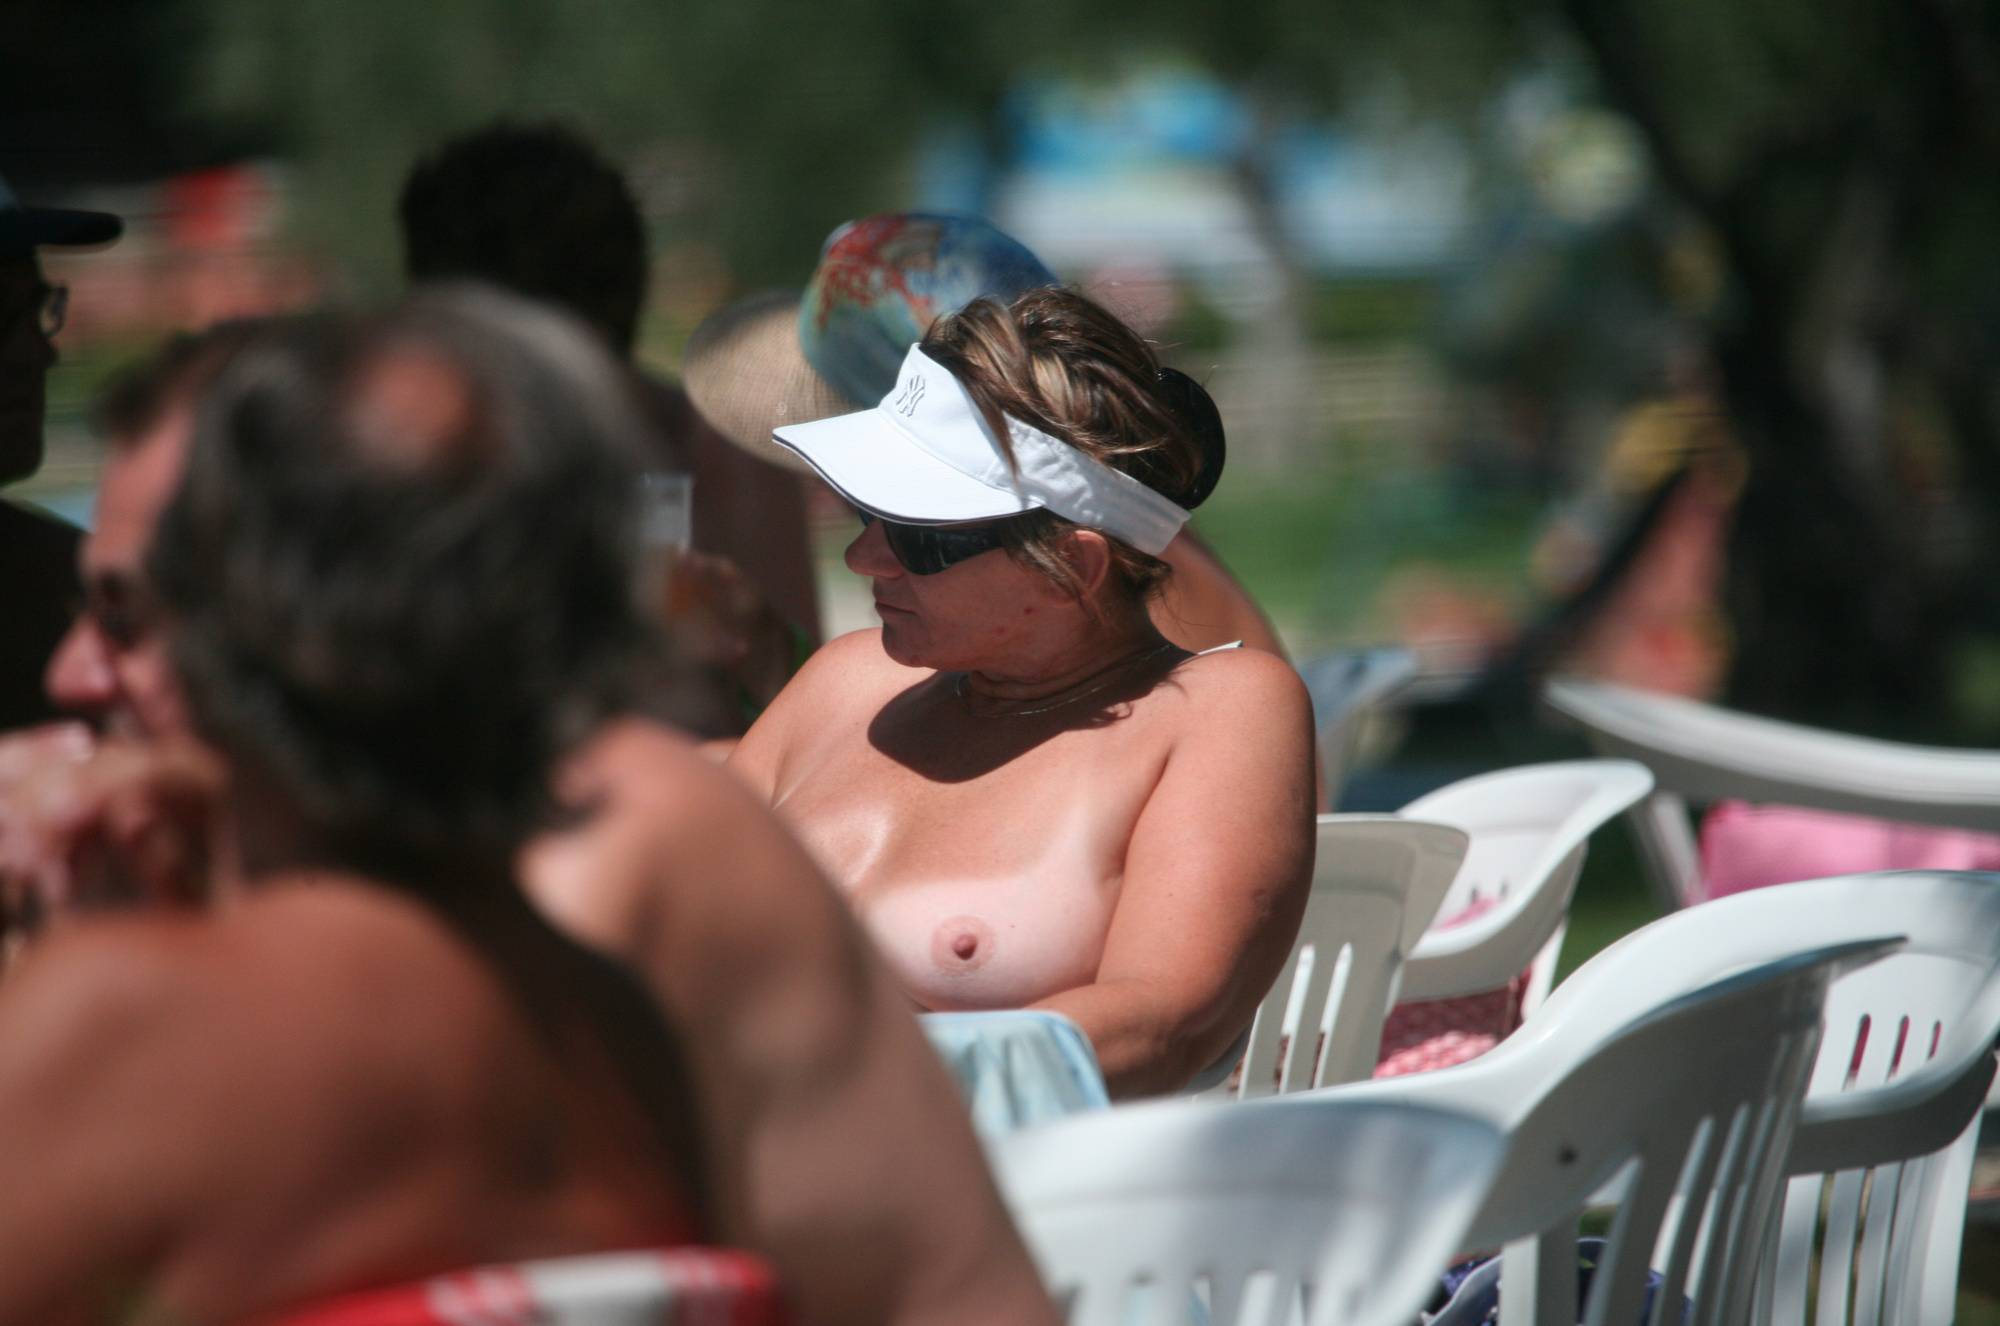 Nudist Pics Pier FKK Outdoor Dinning - 1